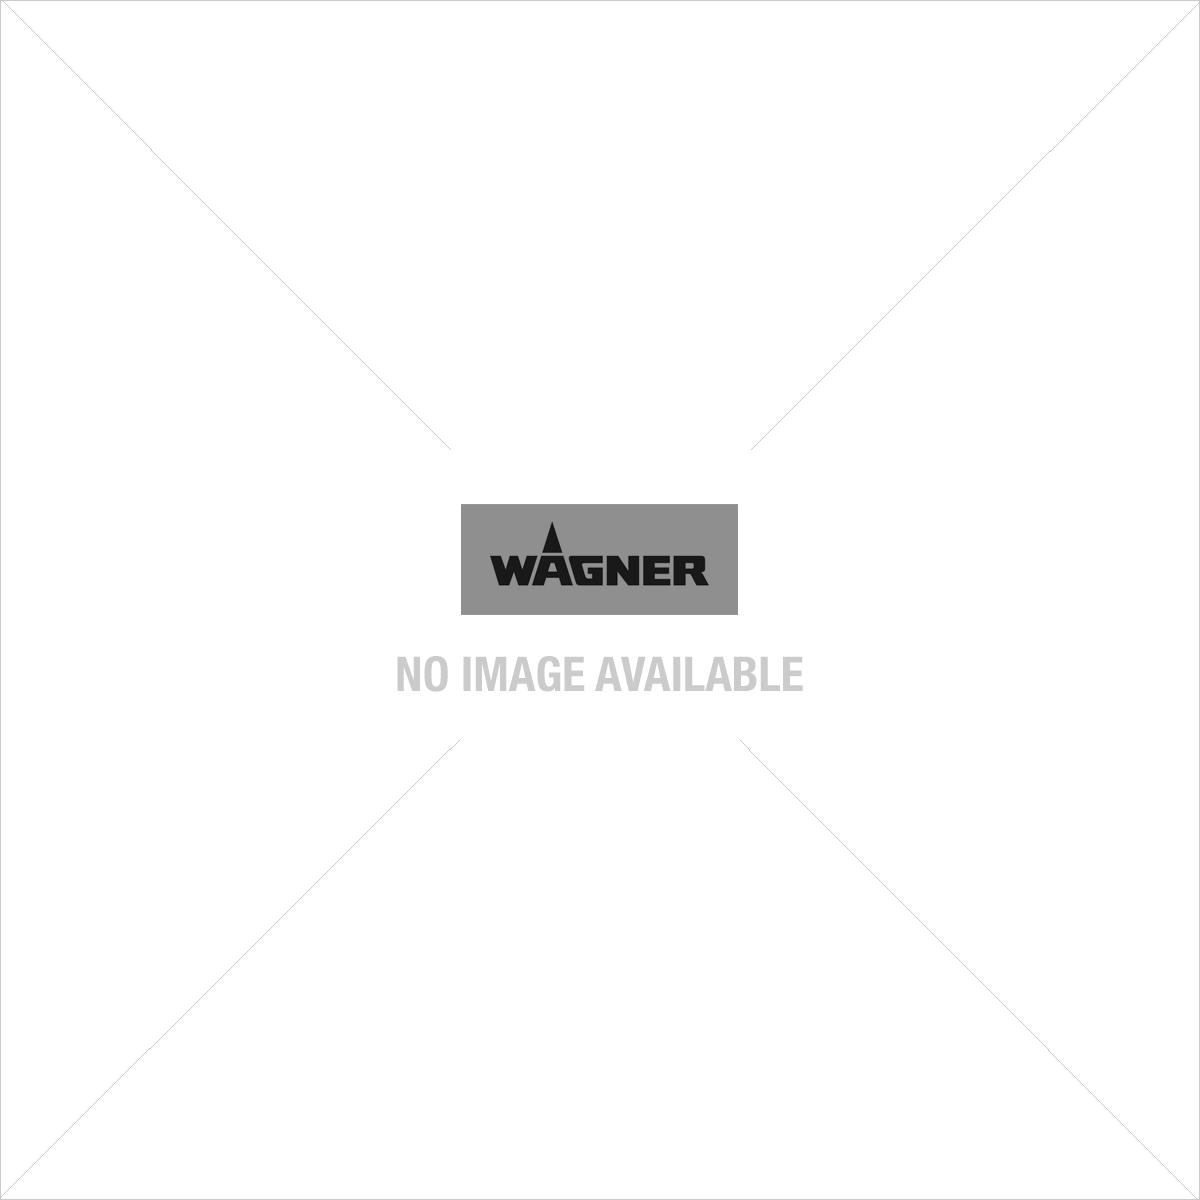 Kit de masquage peinture Wagner - Grand